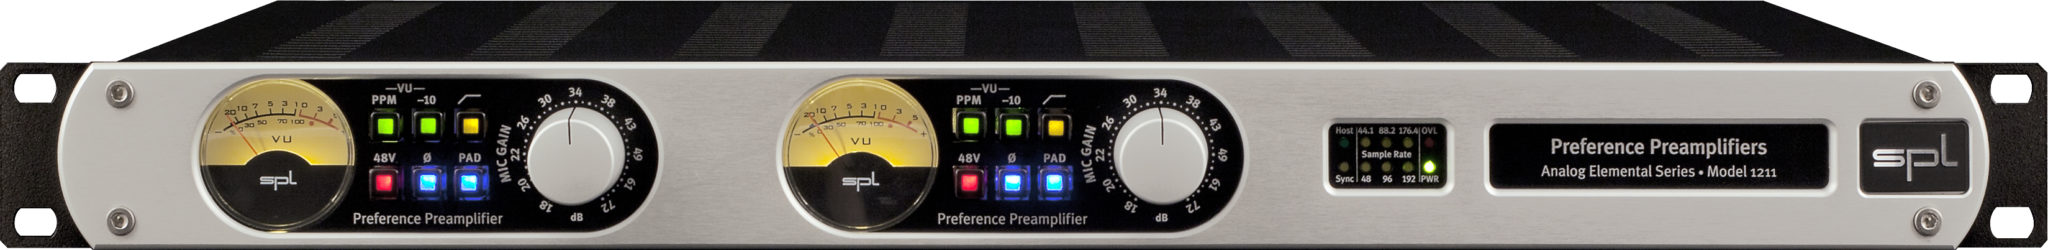 Preference_Preference_front_print